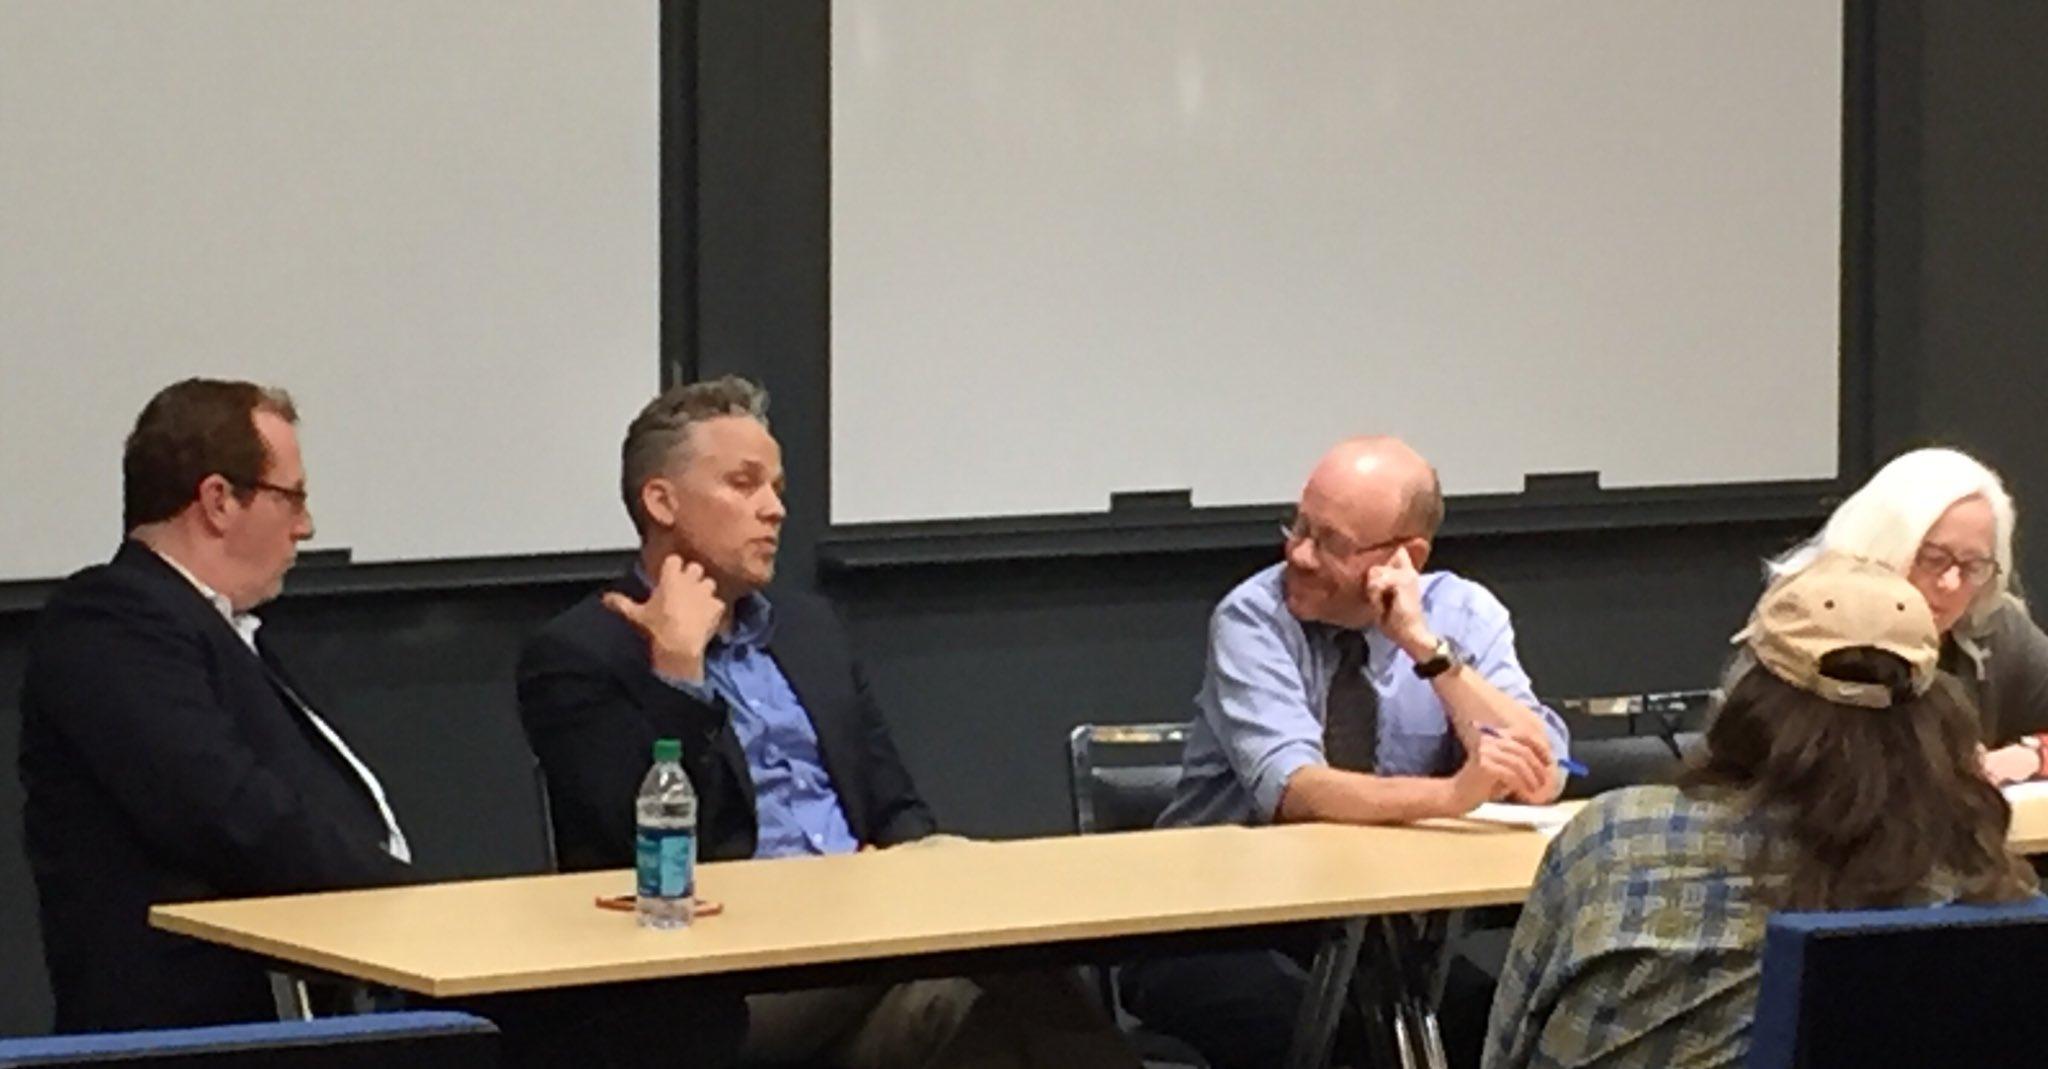 GWU Panel Discussion